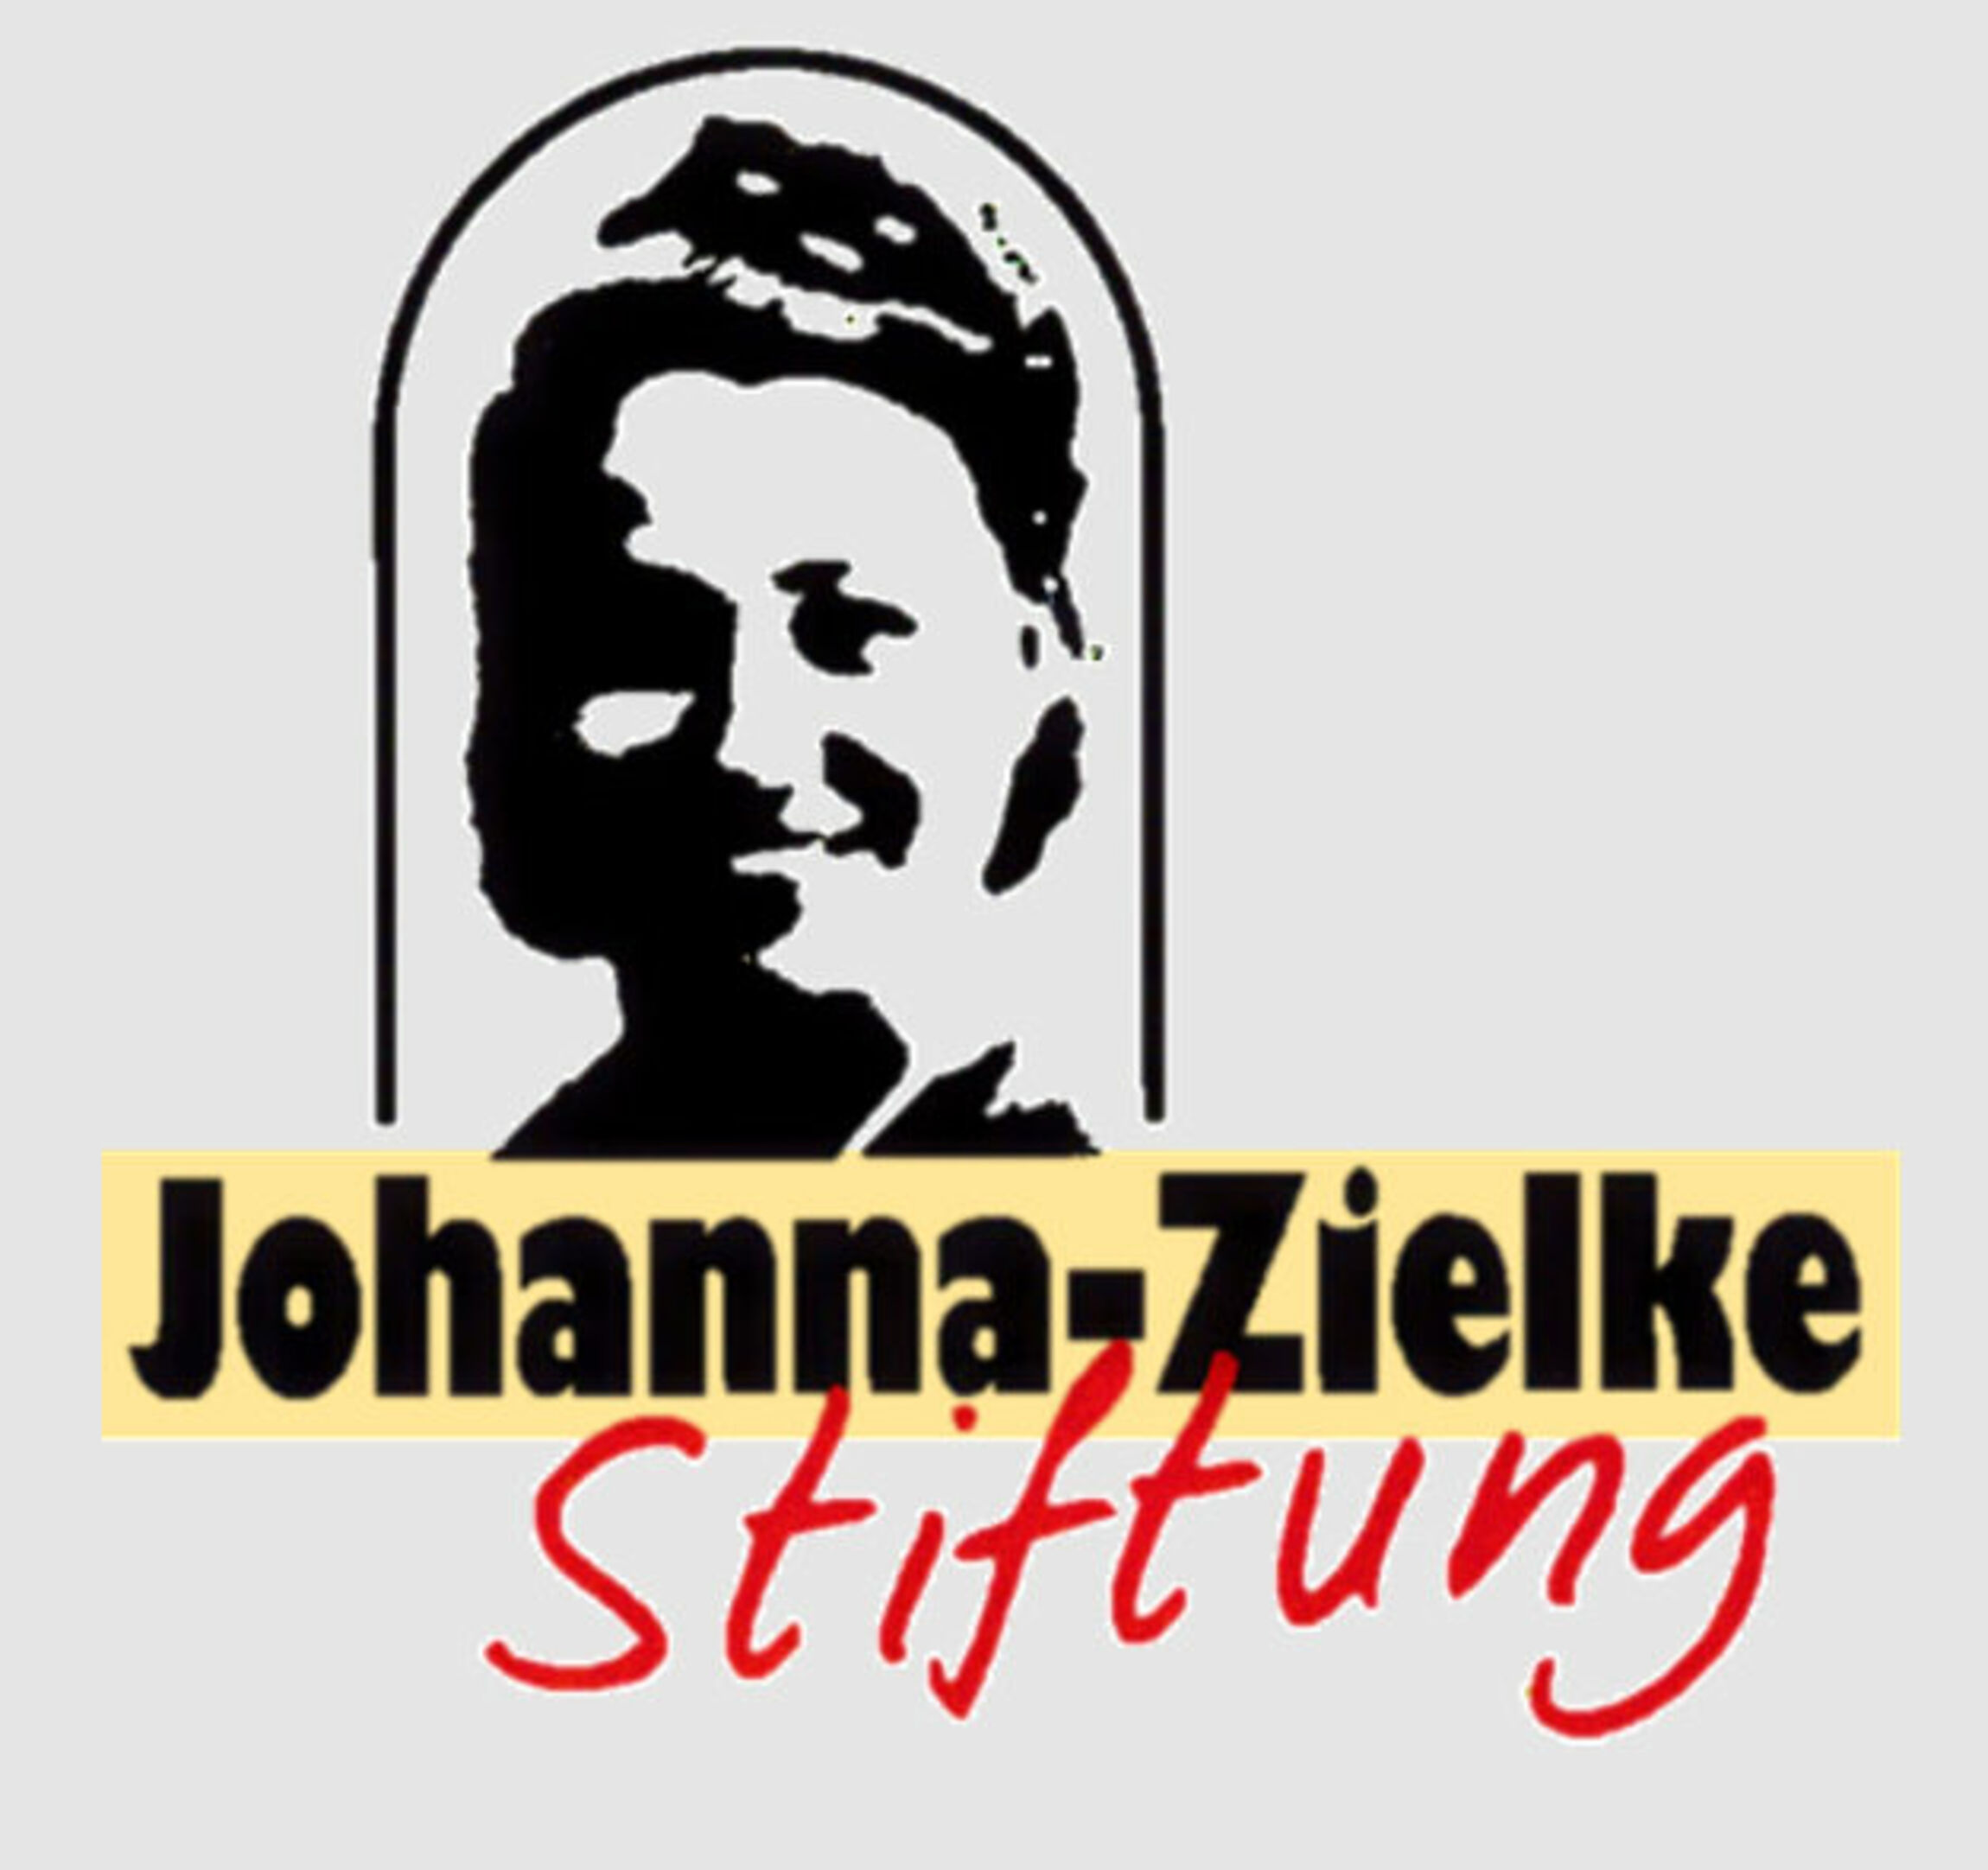 Logo Johanna-Zielke-Stiftung